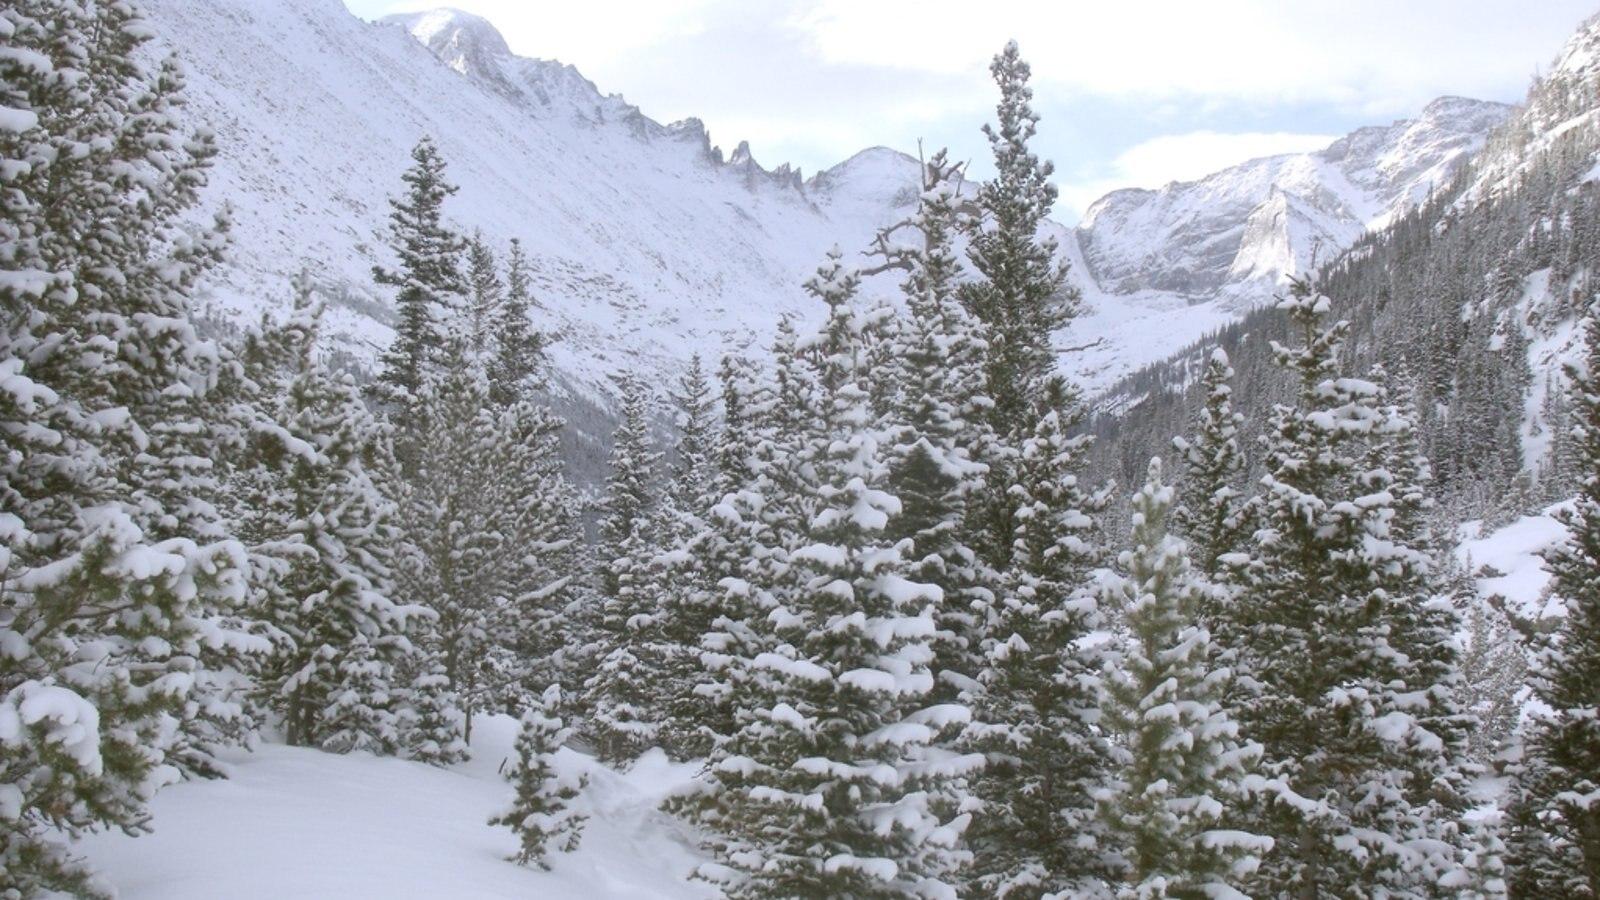 Rocky Mountain National Park caracterizando cenas tranquilas e neve